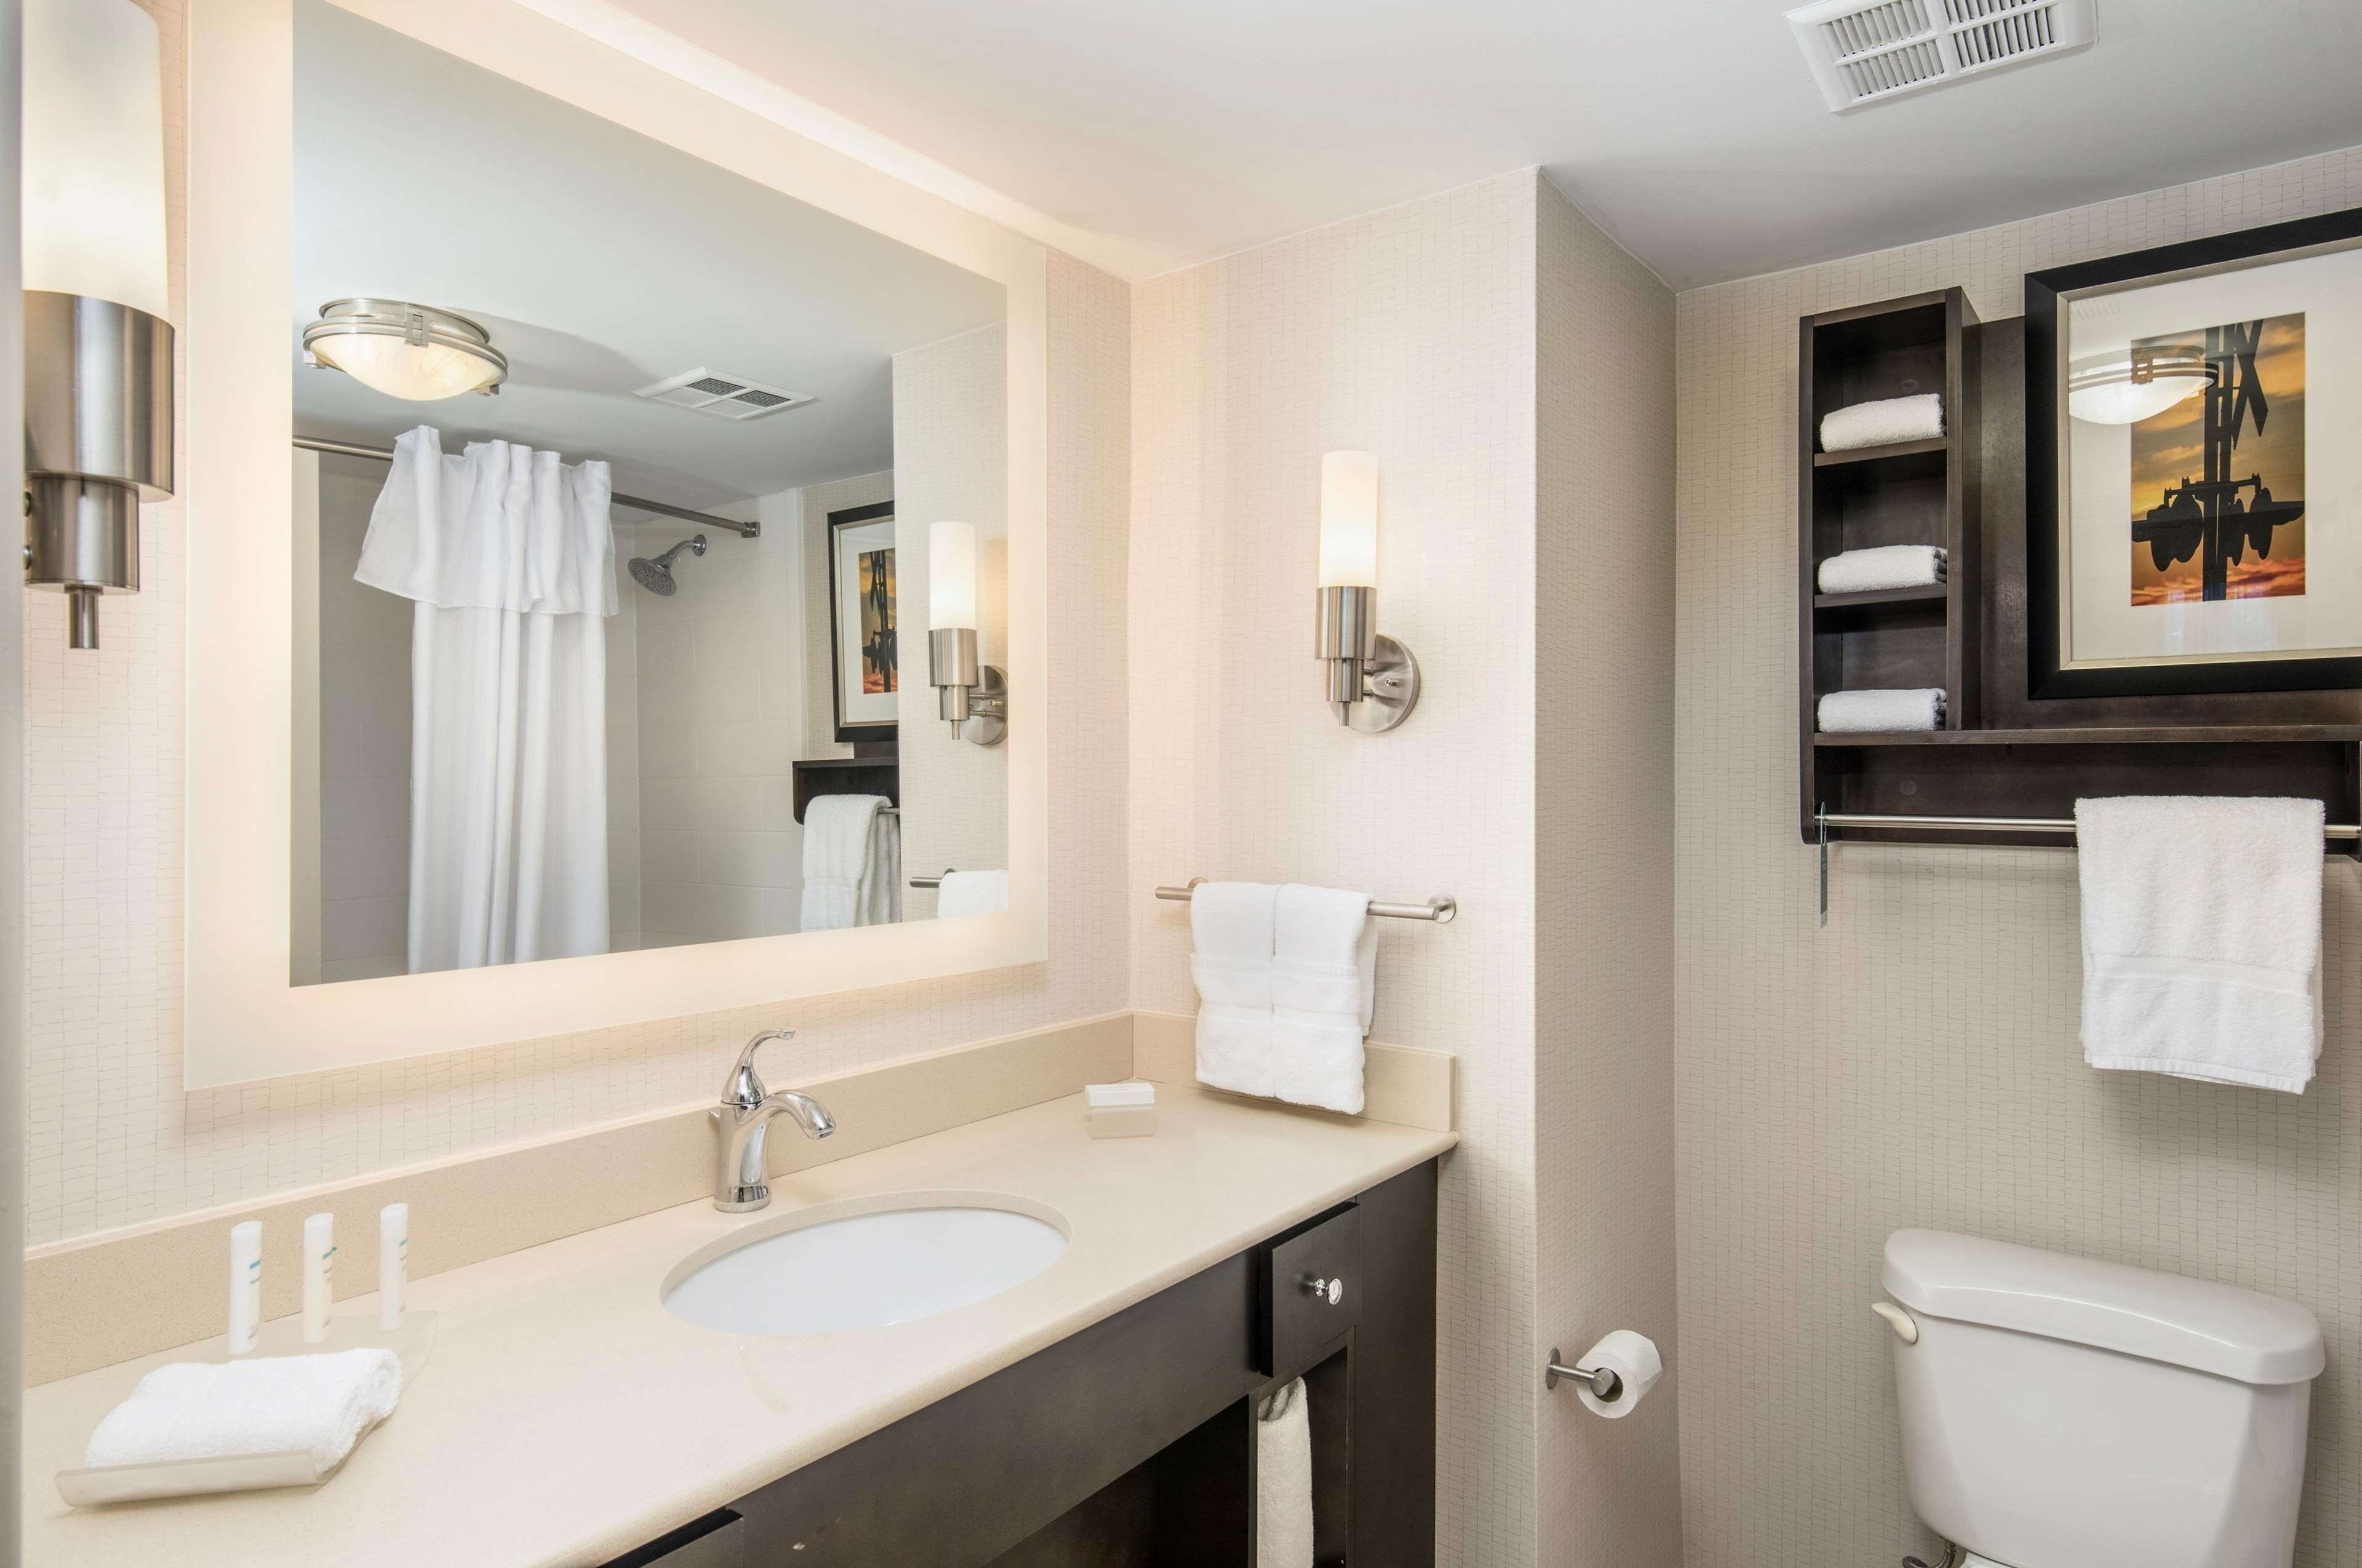 Homewood Suites by Hilton Austin-South/Airport image 13